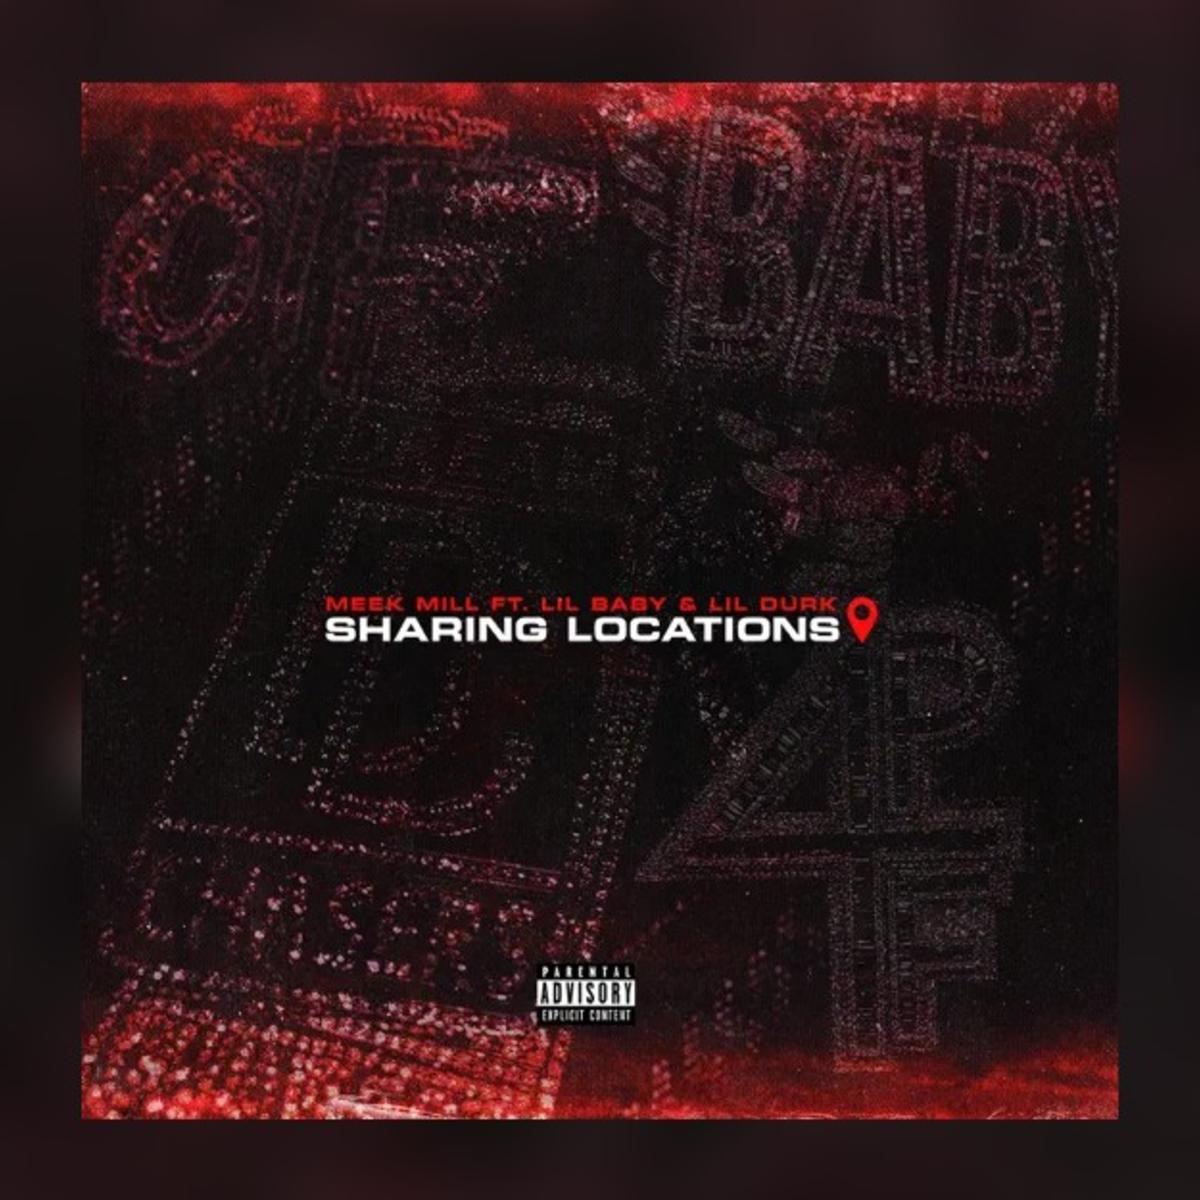 دانلود آهنگ Meek Mill Sharing Locations (feat. Lil Baby & Lil Durk) feat Lil Durk and Lil Baby